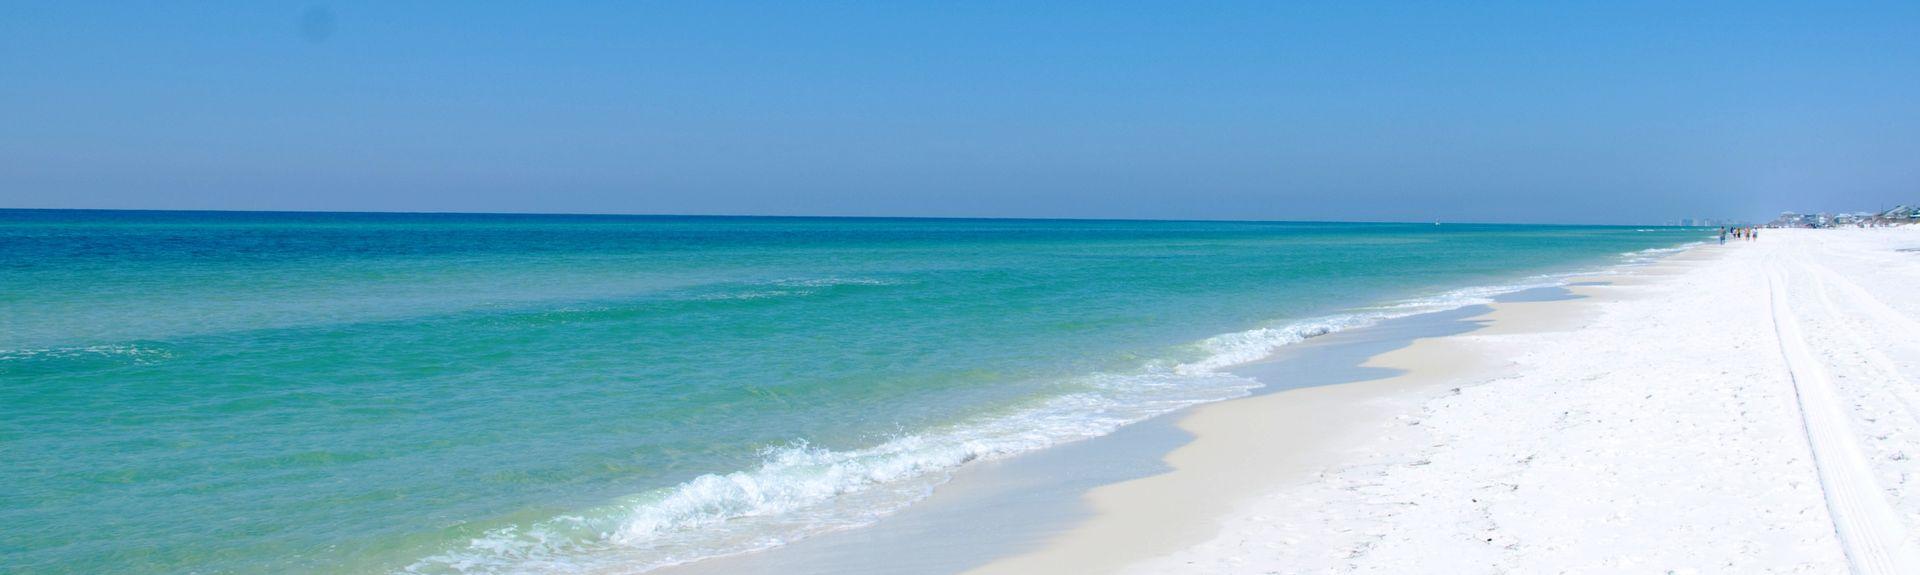 San Remo (Santa Rosa Beach, Florida, Stati Uniti d'America)